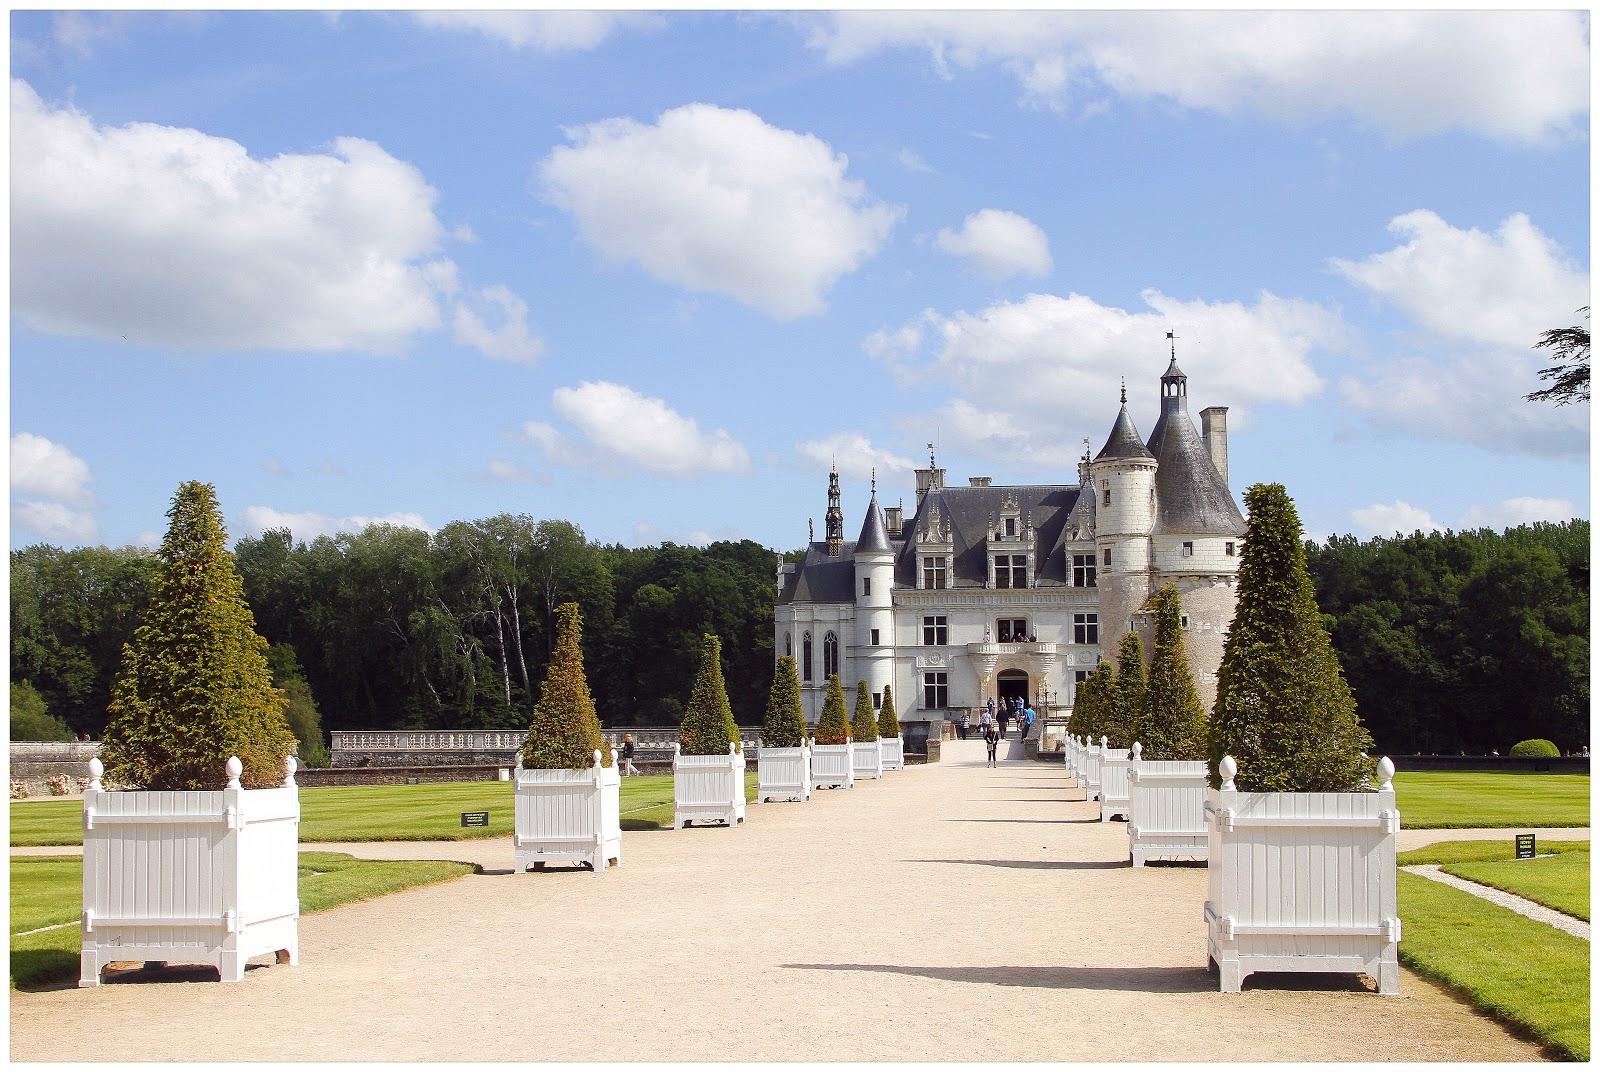 24_Chateau chnonceau1_副本.jpg